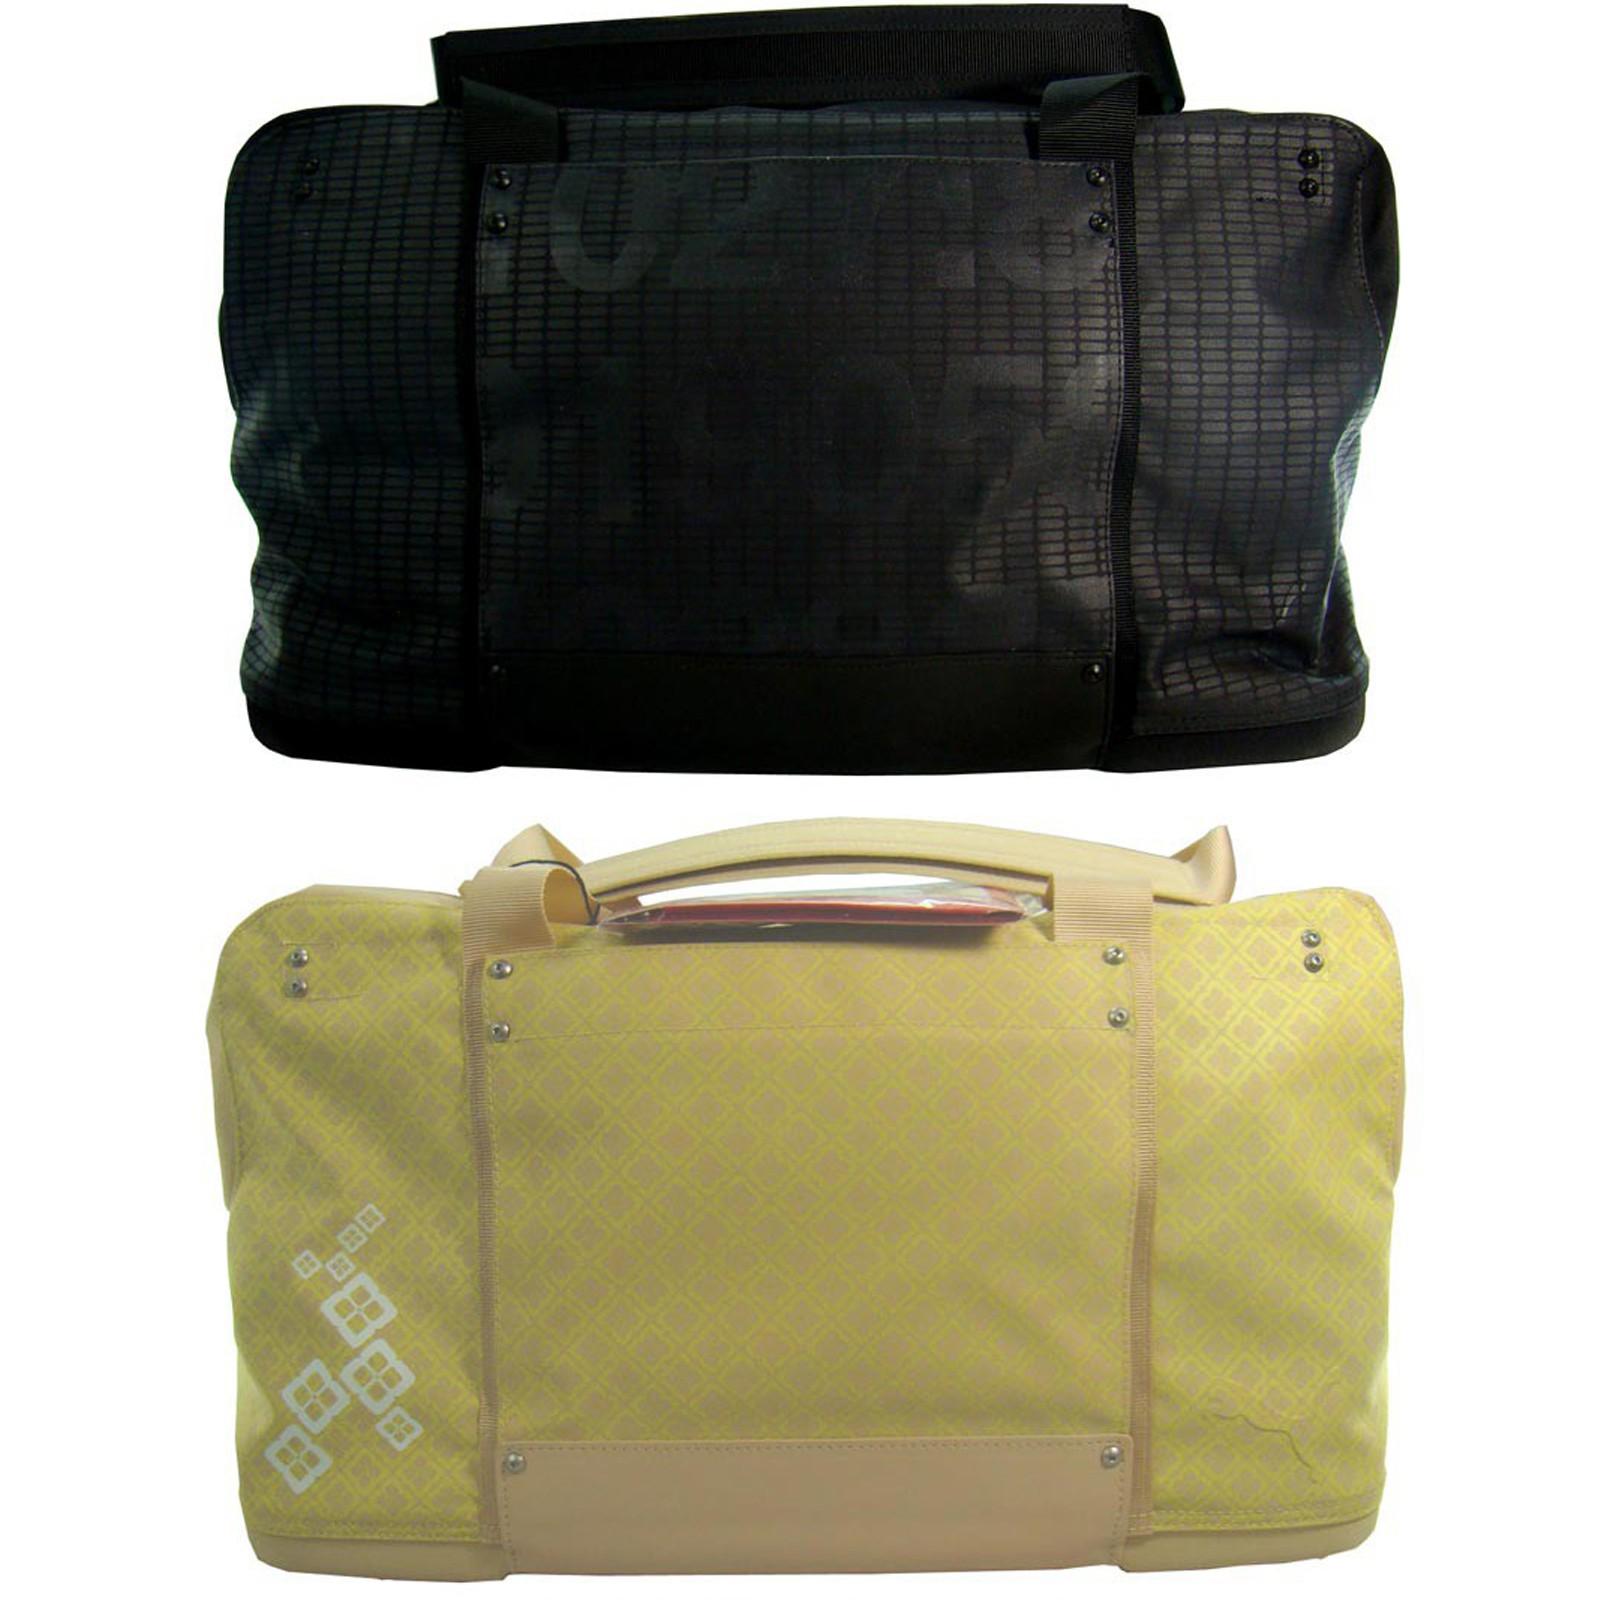 e1a67e18fa3f0 Puma Reisetasche Sporttasche verschiedene Modelle Trainingstasche  Sporttasche